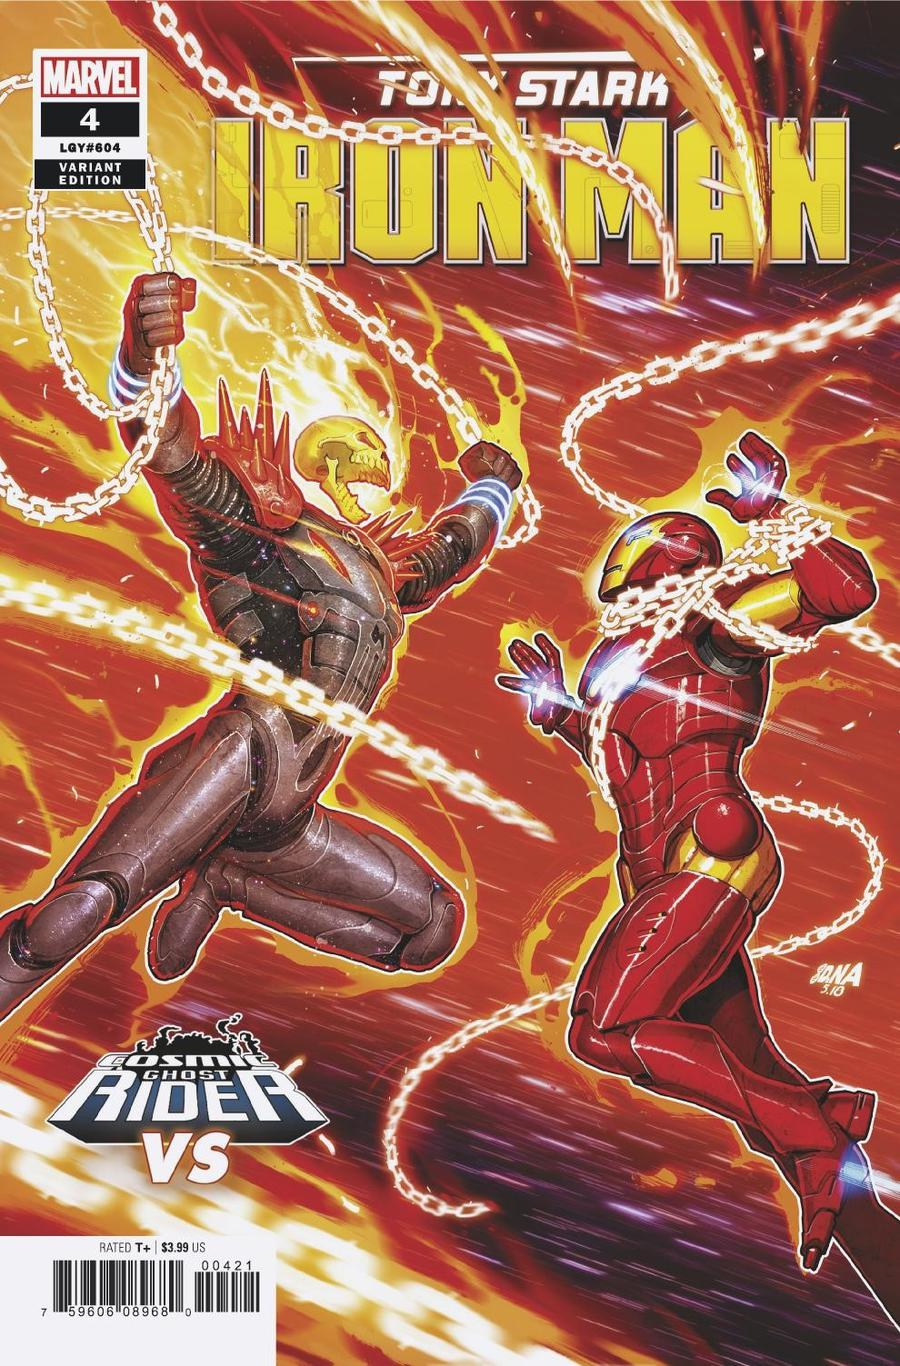 Tony Stark Iron Man #4 Cover B Variant David Nakayama Cosmic Ghost Rider VS Cover